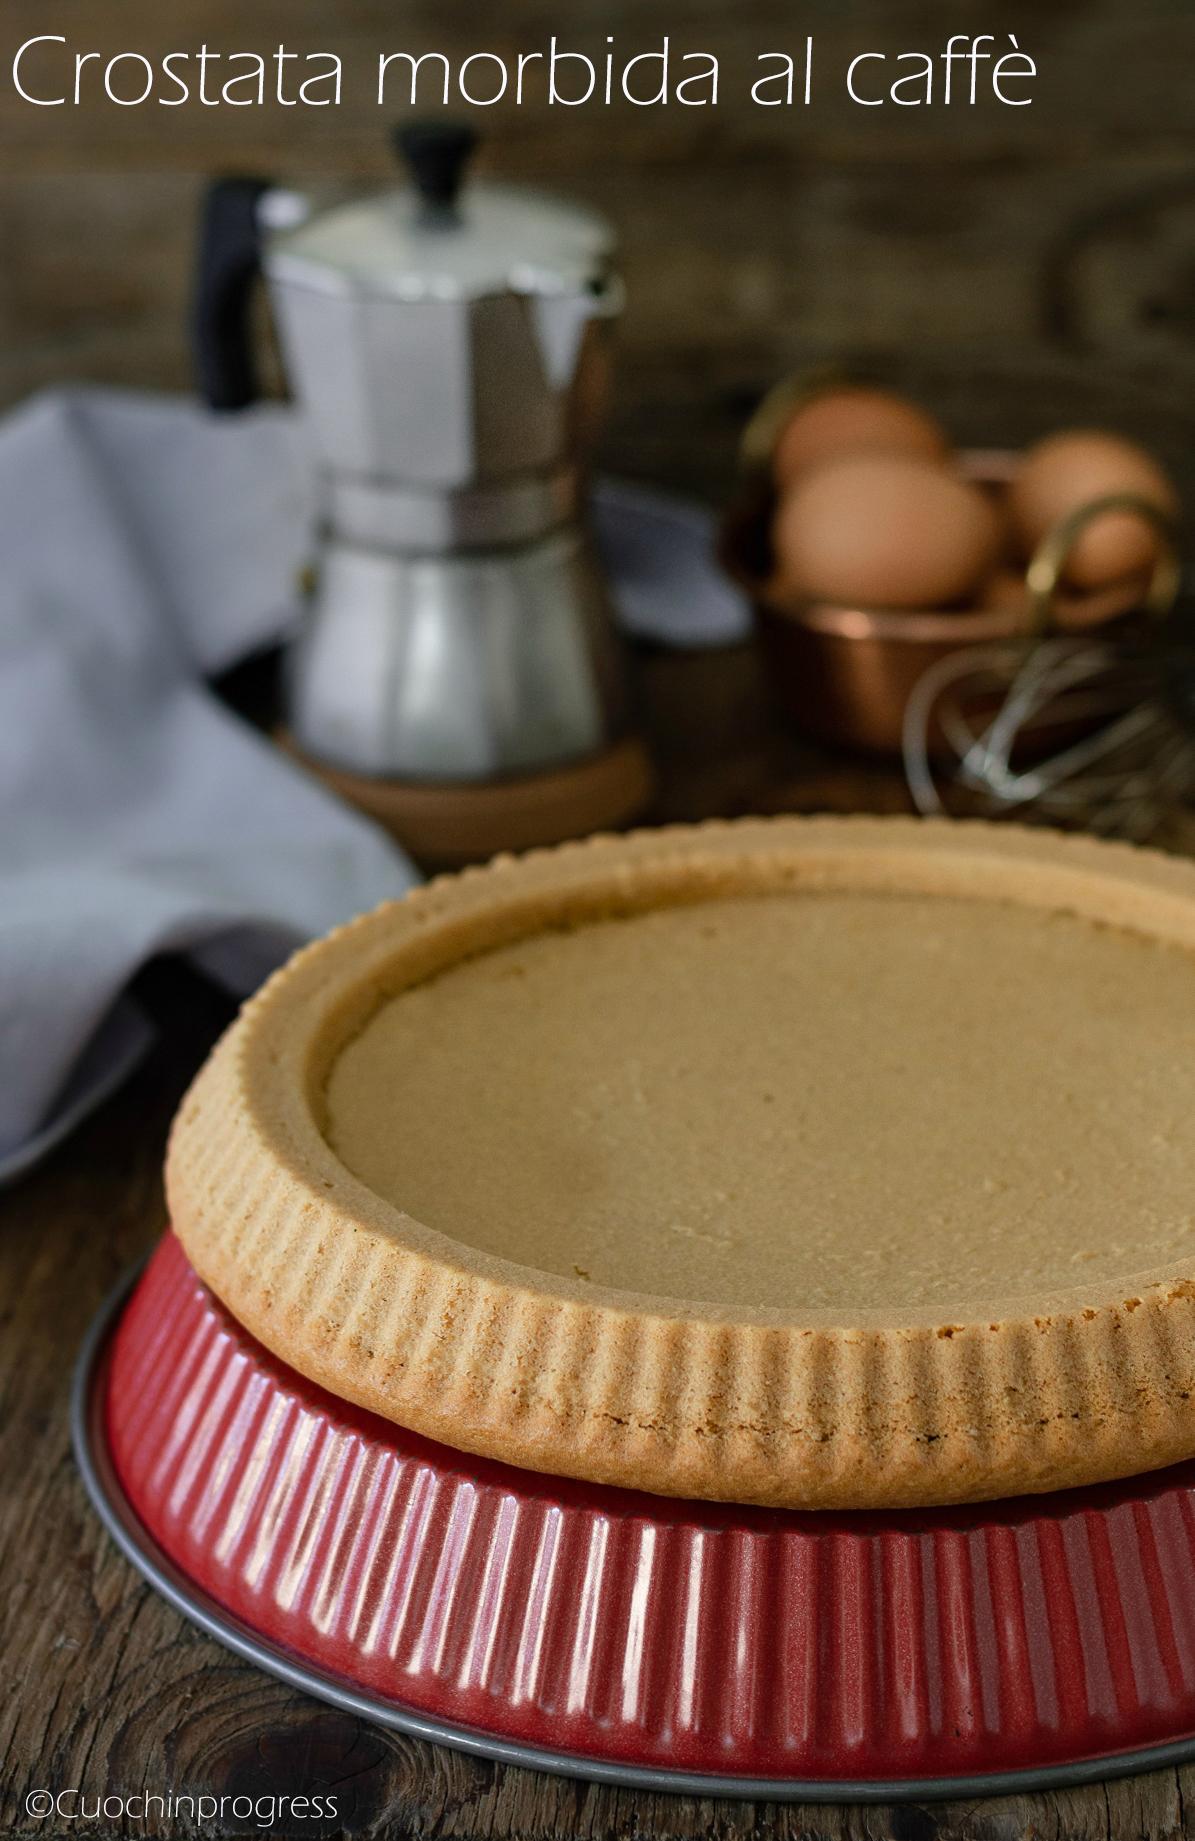 crostata morbida al caffè